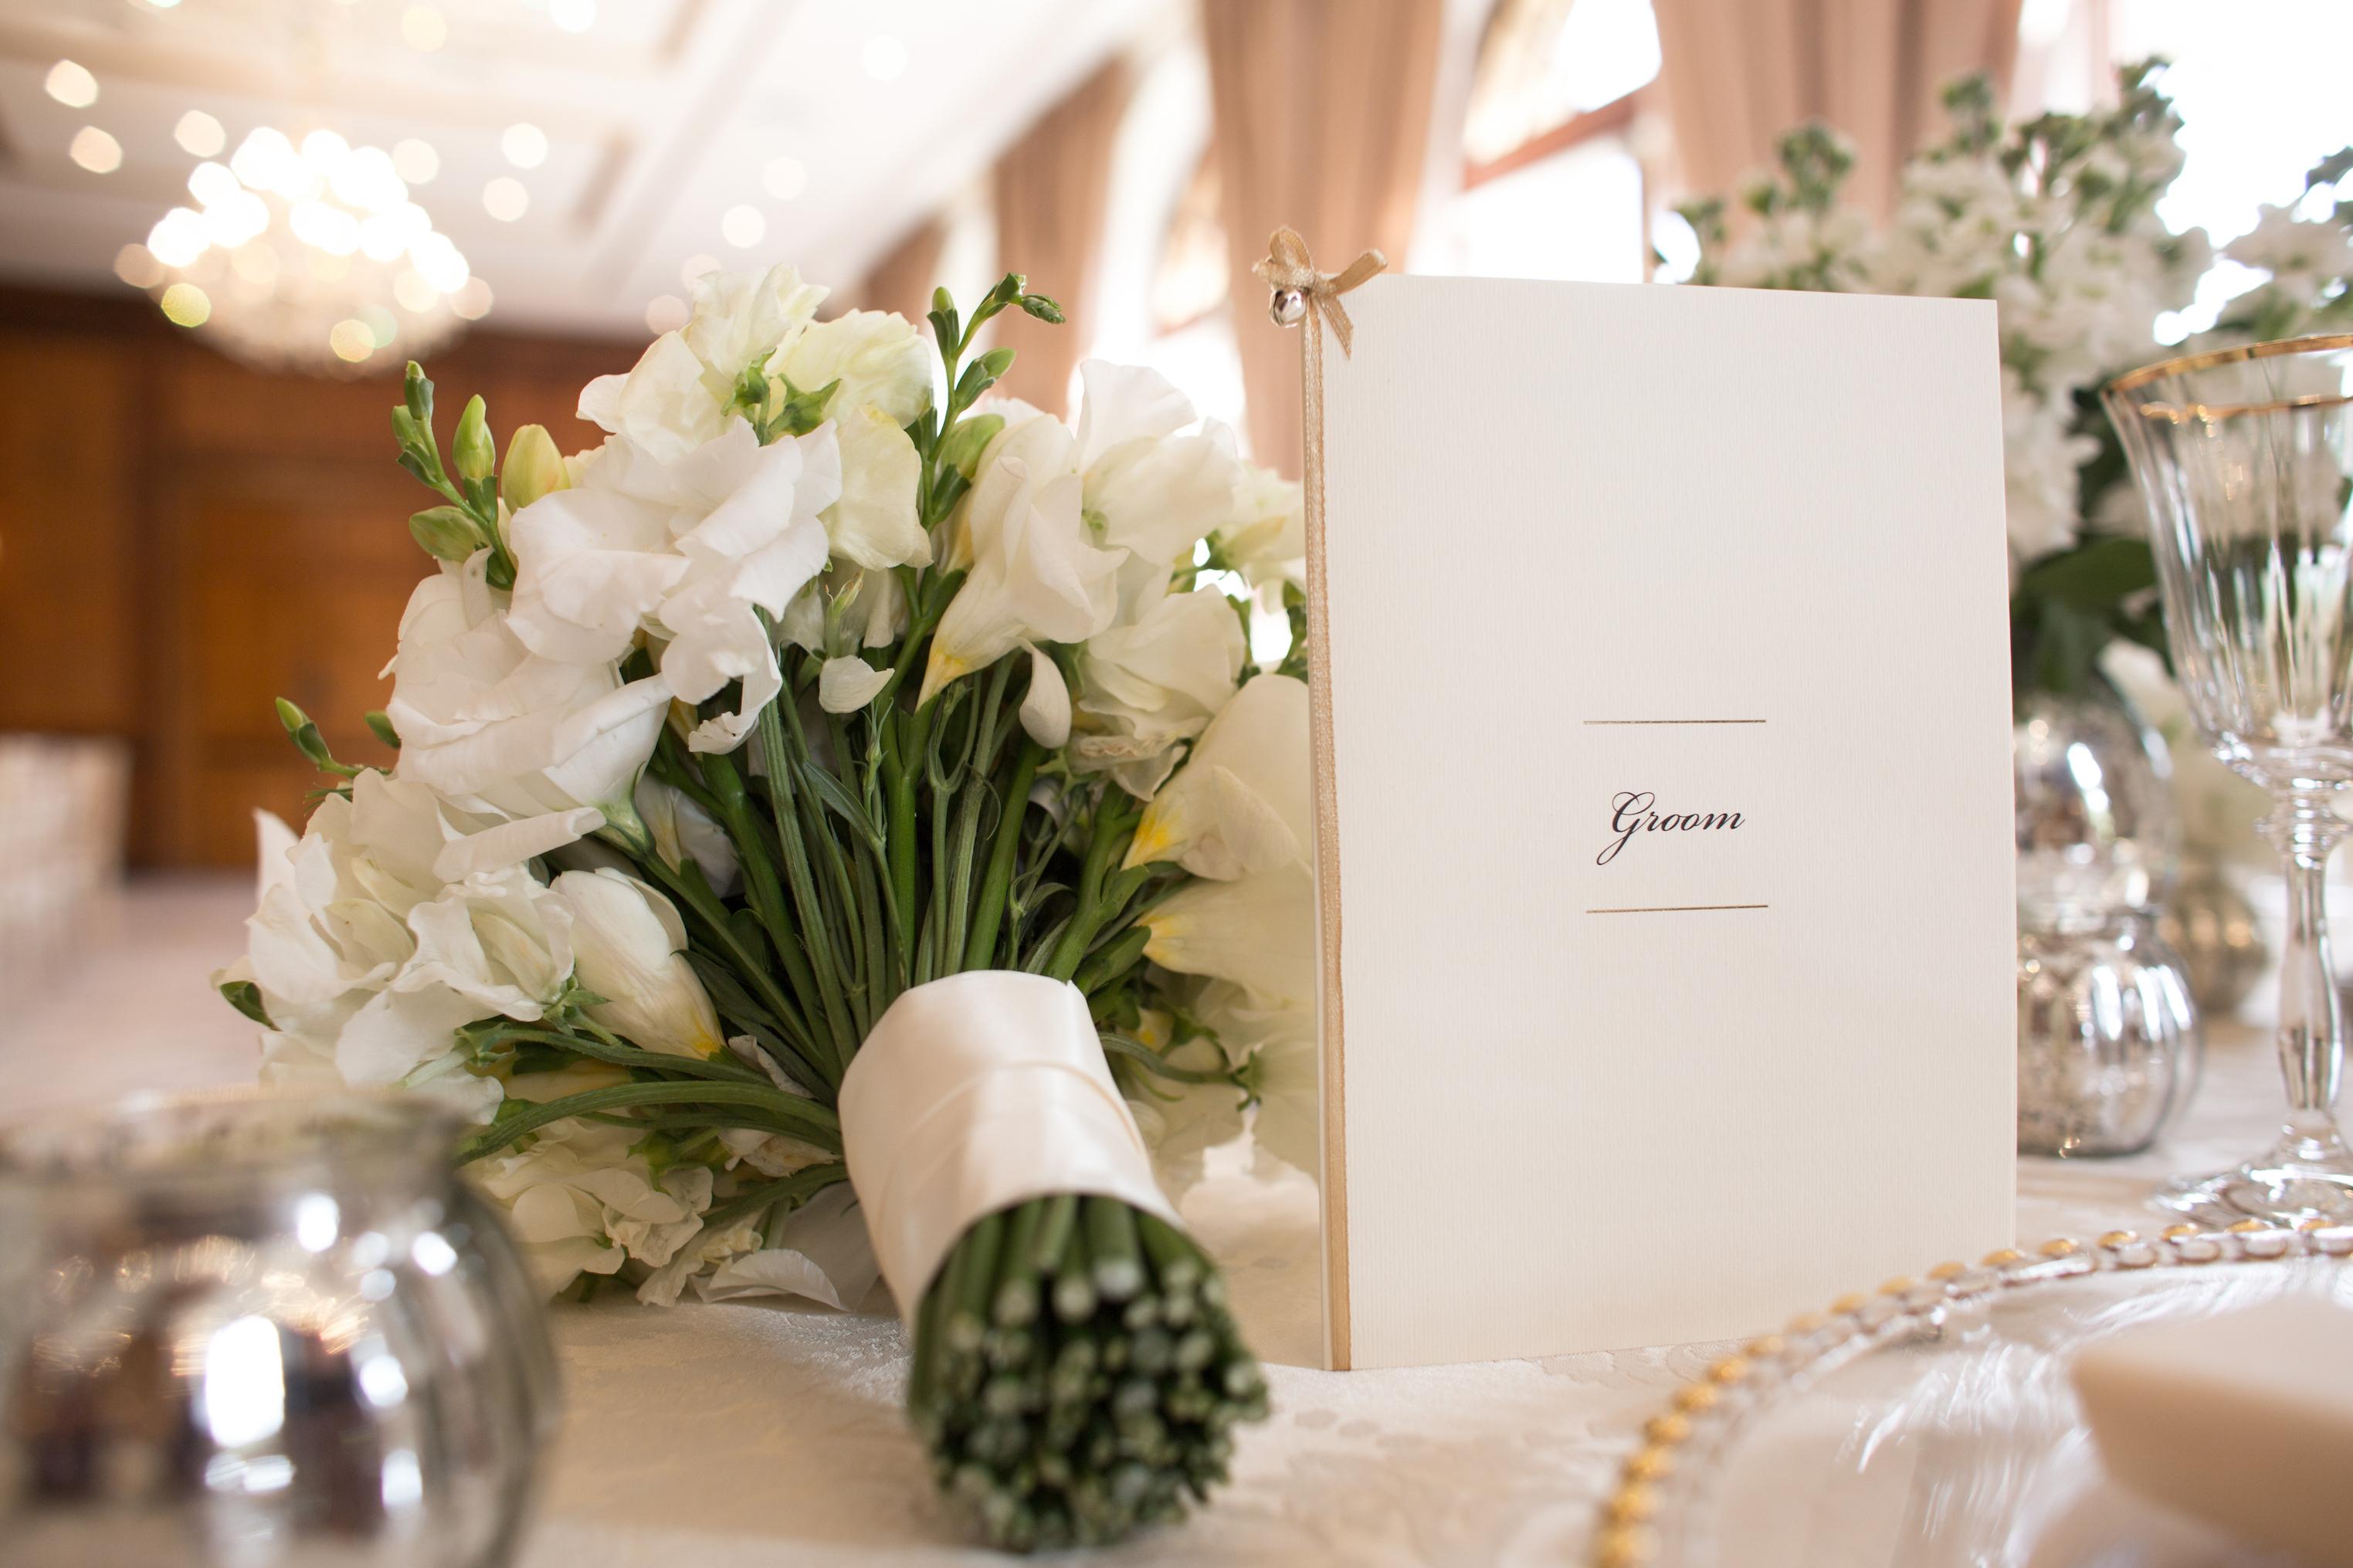 Fabulous elegant wedding flowers Hedsor House Joanna Carter Wedding Flowers Oxford Oxfordshire Buckinghamshire Berkshire Surrey London